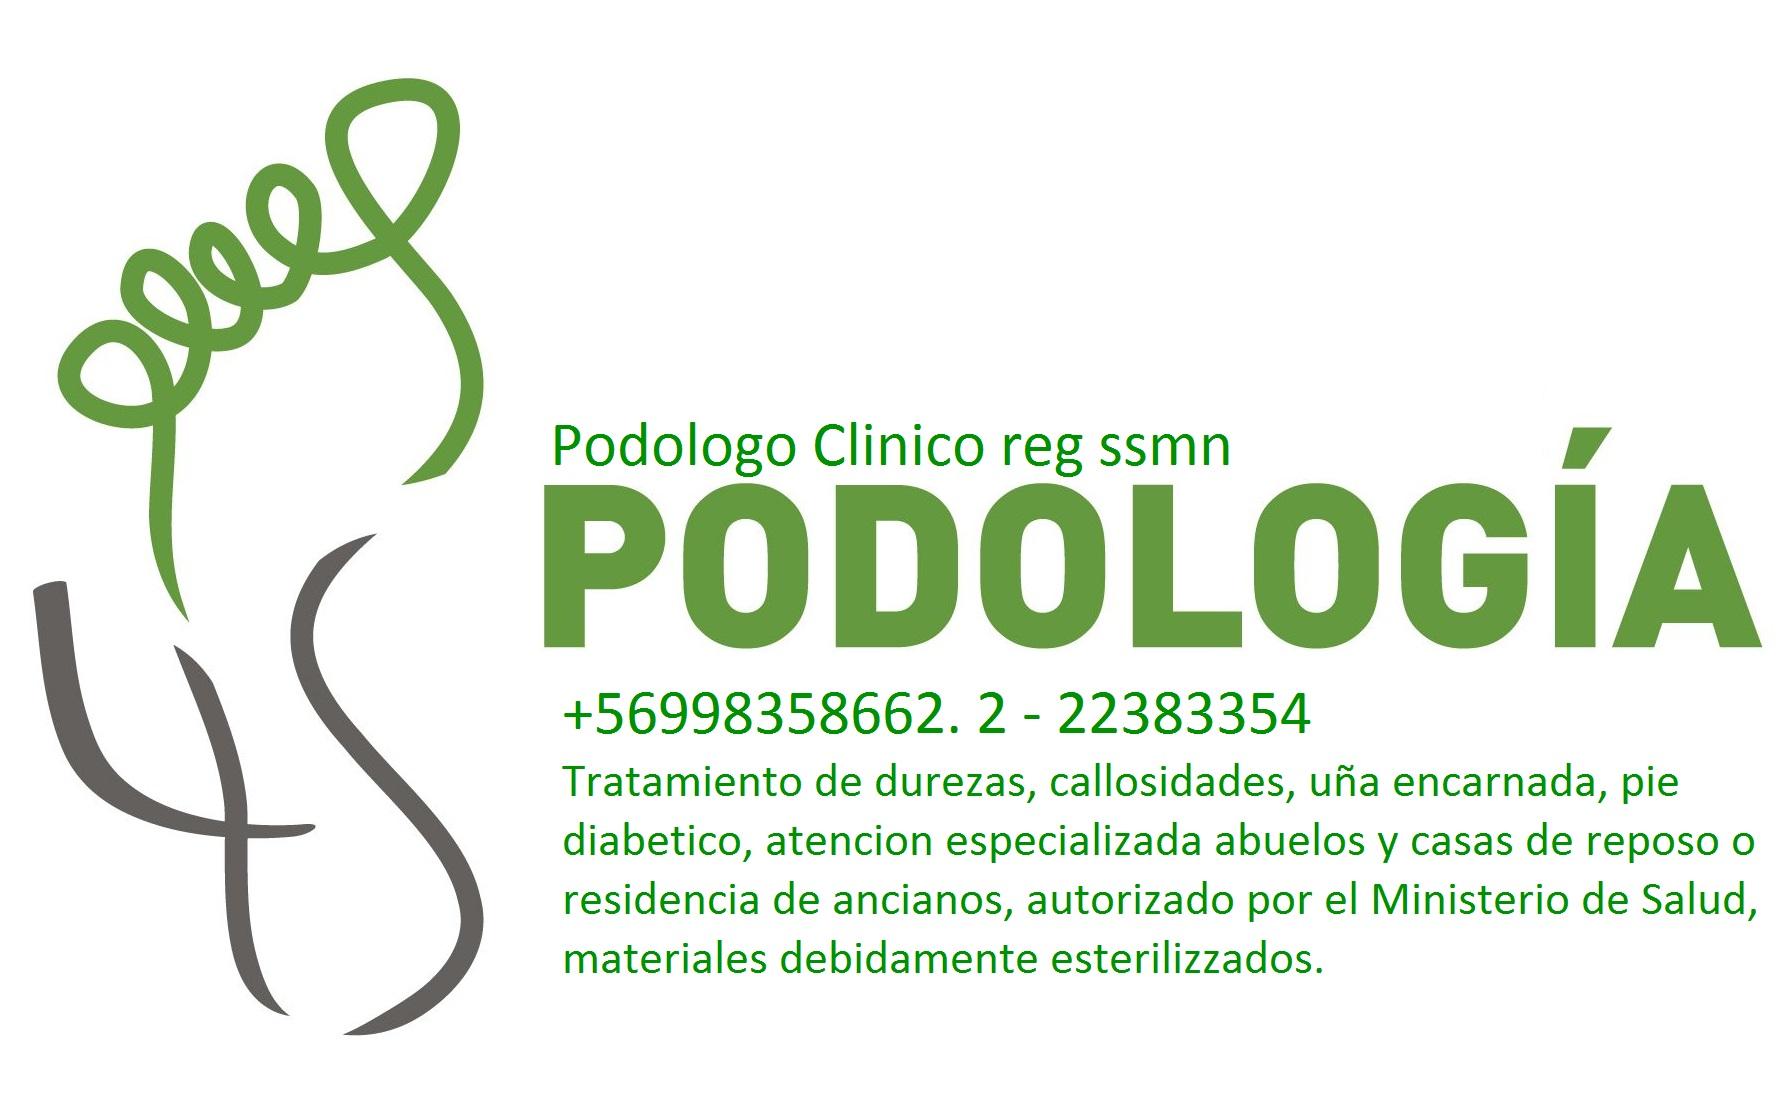 PODOLOGIA DIABETICA Providencia +569 98358662